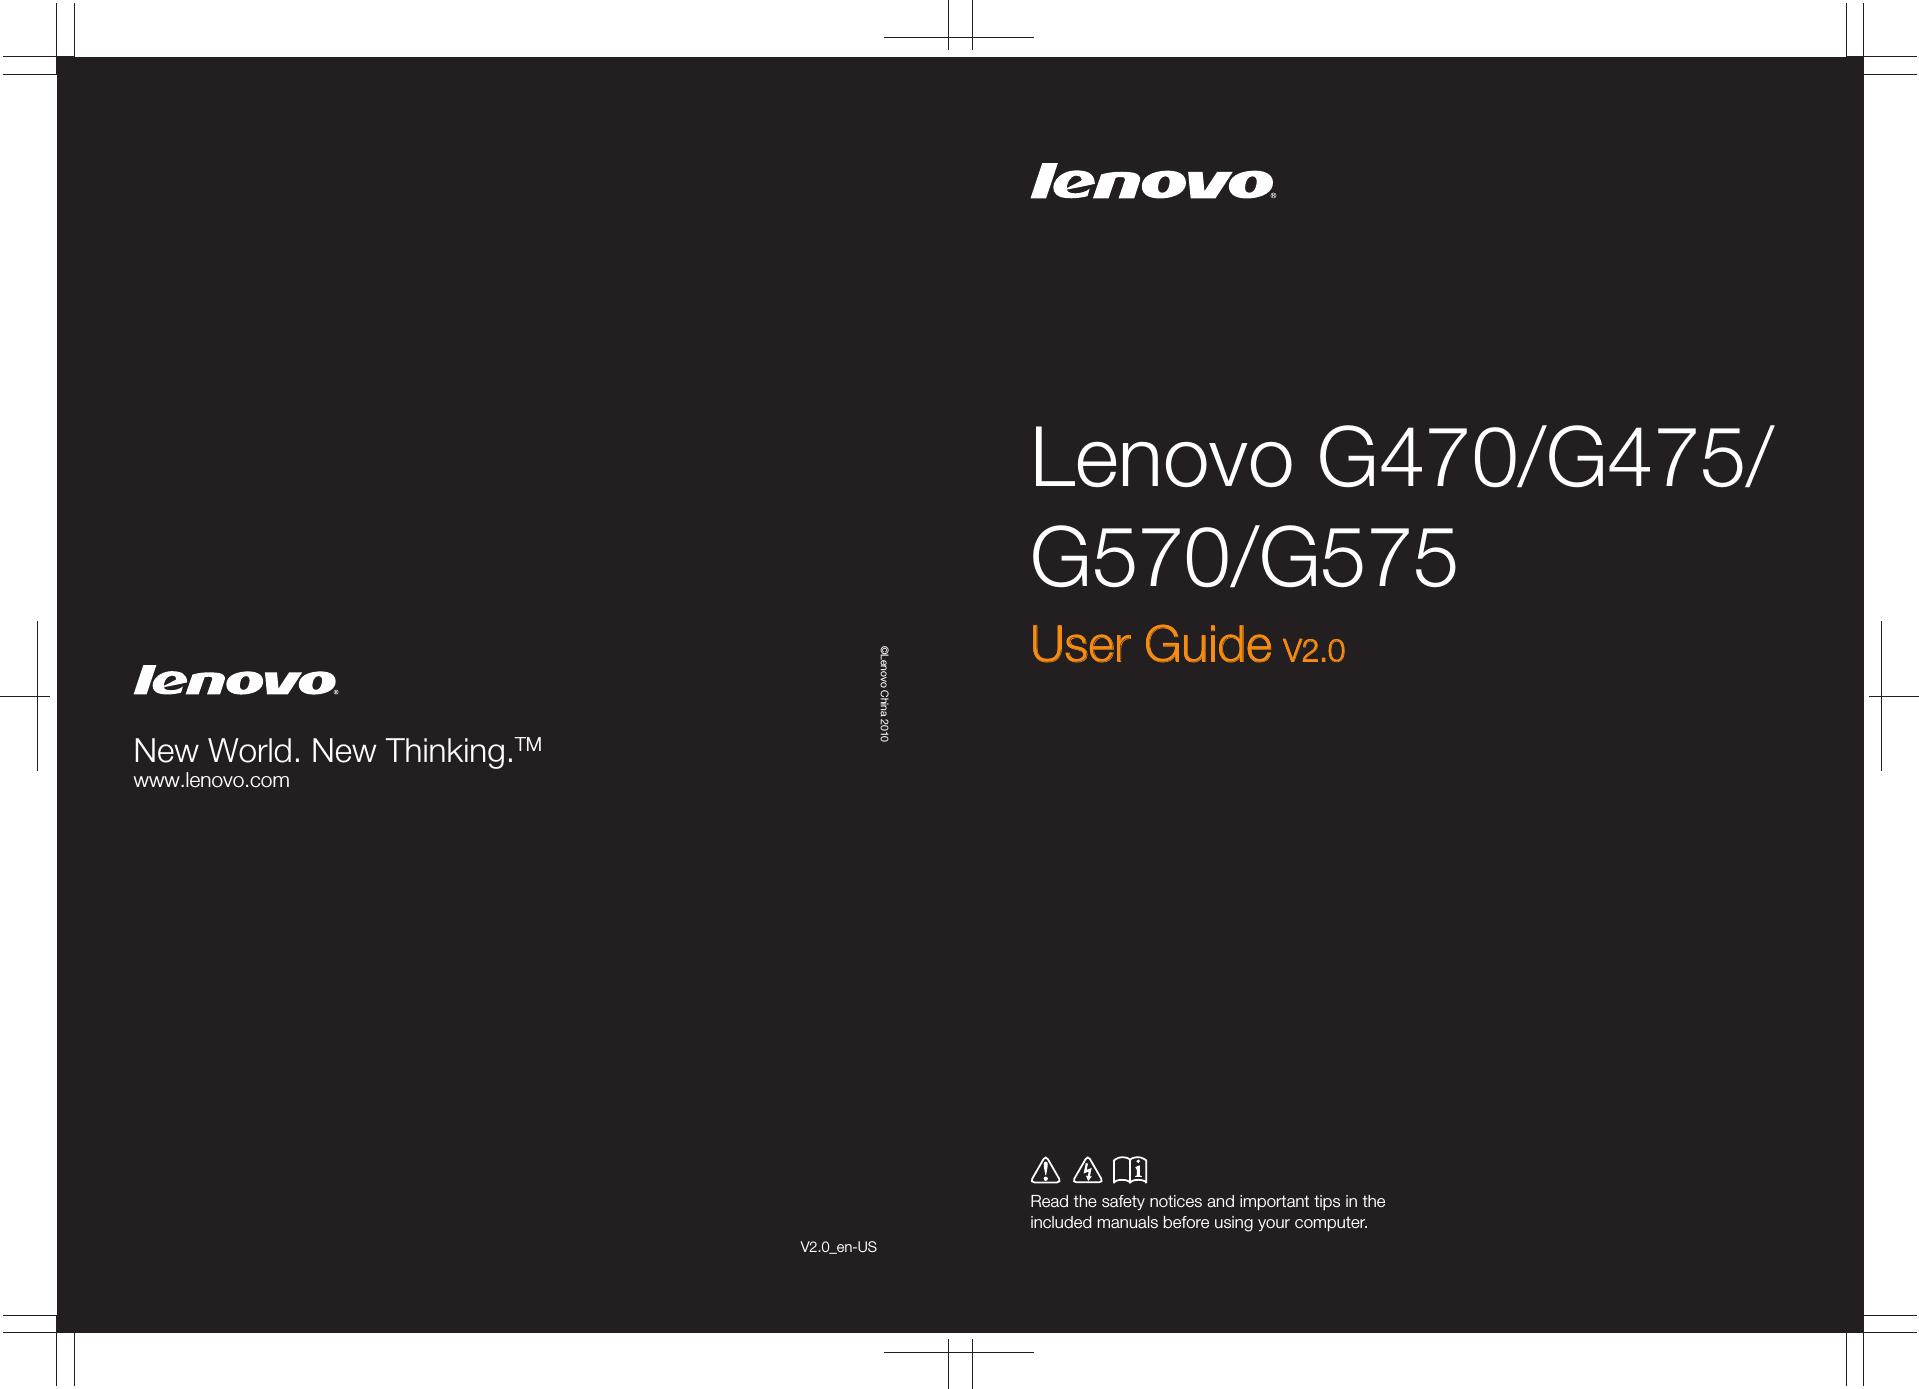 Phaser 3250 manual ebook array spa manual der keiler online user manual u2022 rh pandadigital co fandeluxe Images